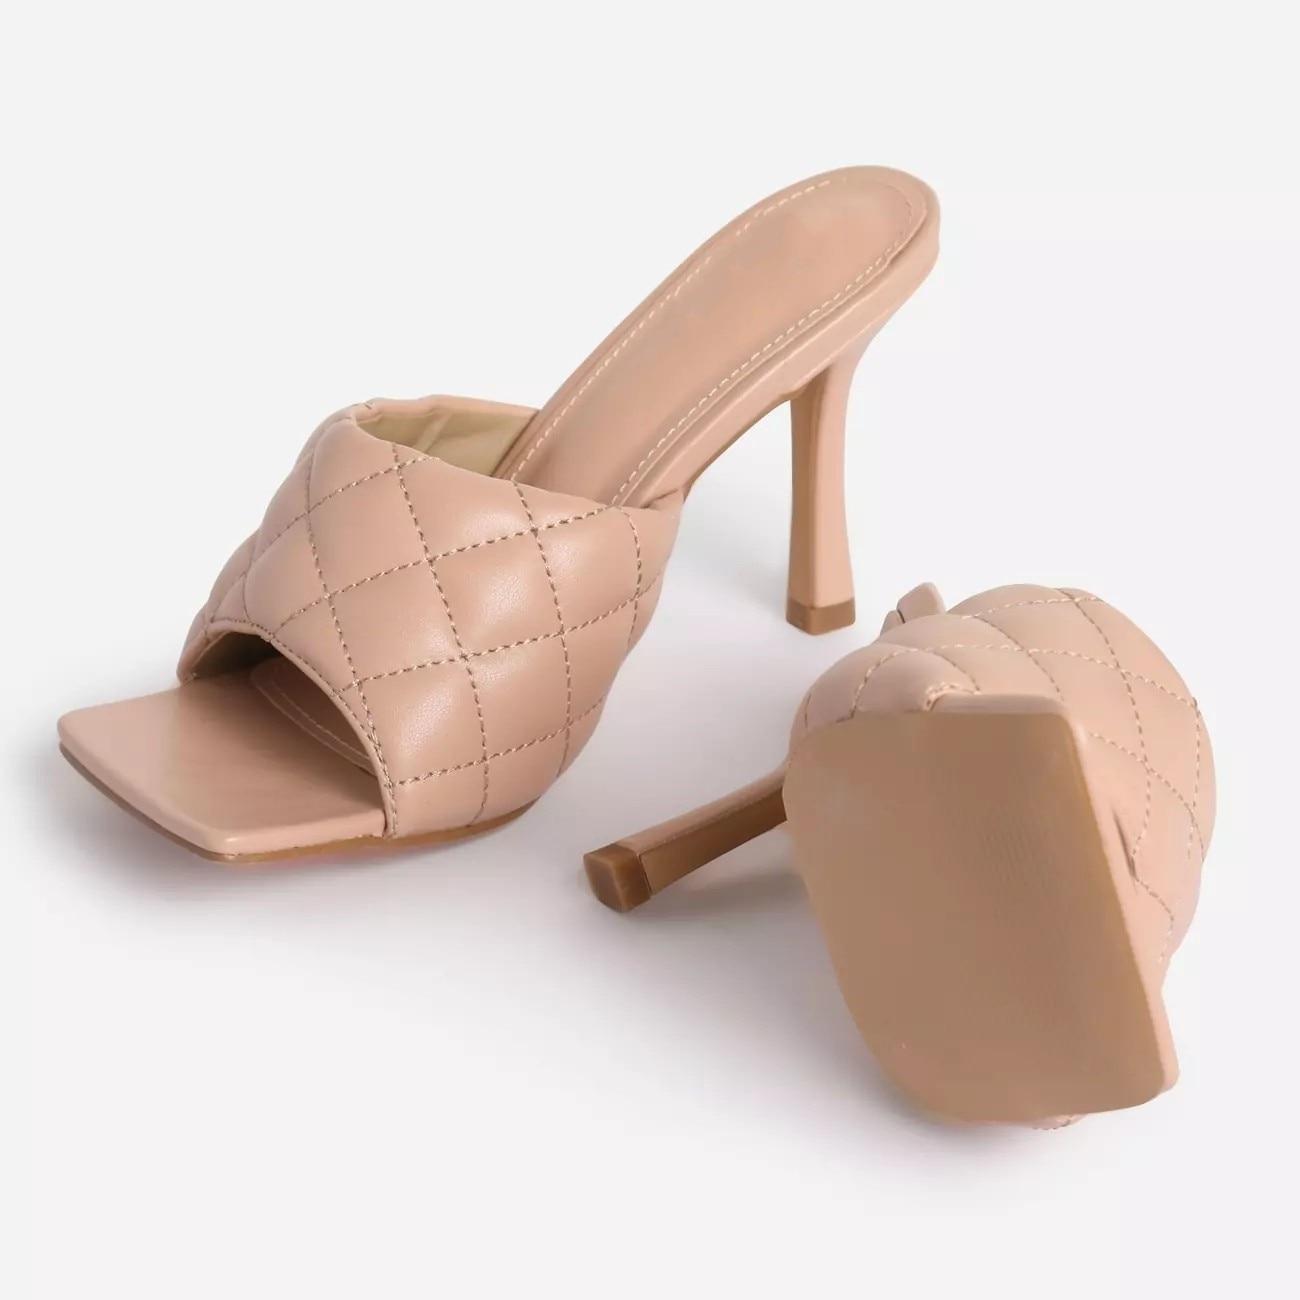 MHYONS Vintage Square Toe Slipper Sandals Women Solid Gingham High Heel Women's Sandals Block Heel Ladies Shoes Women